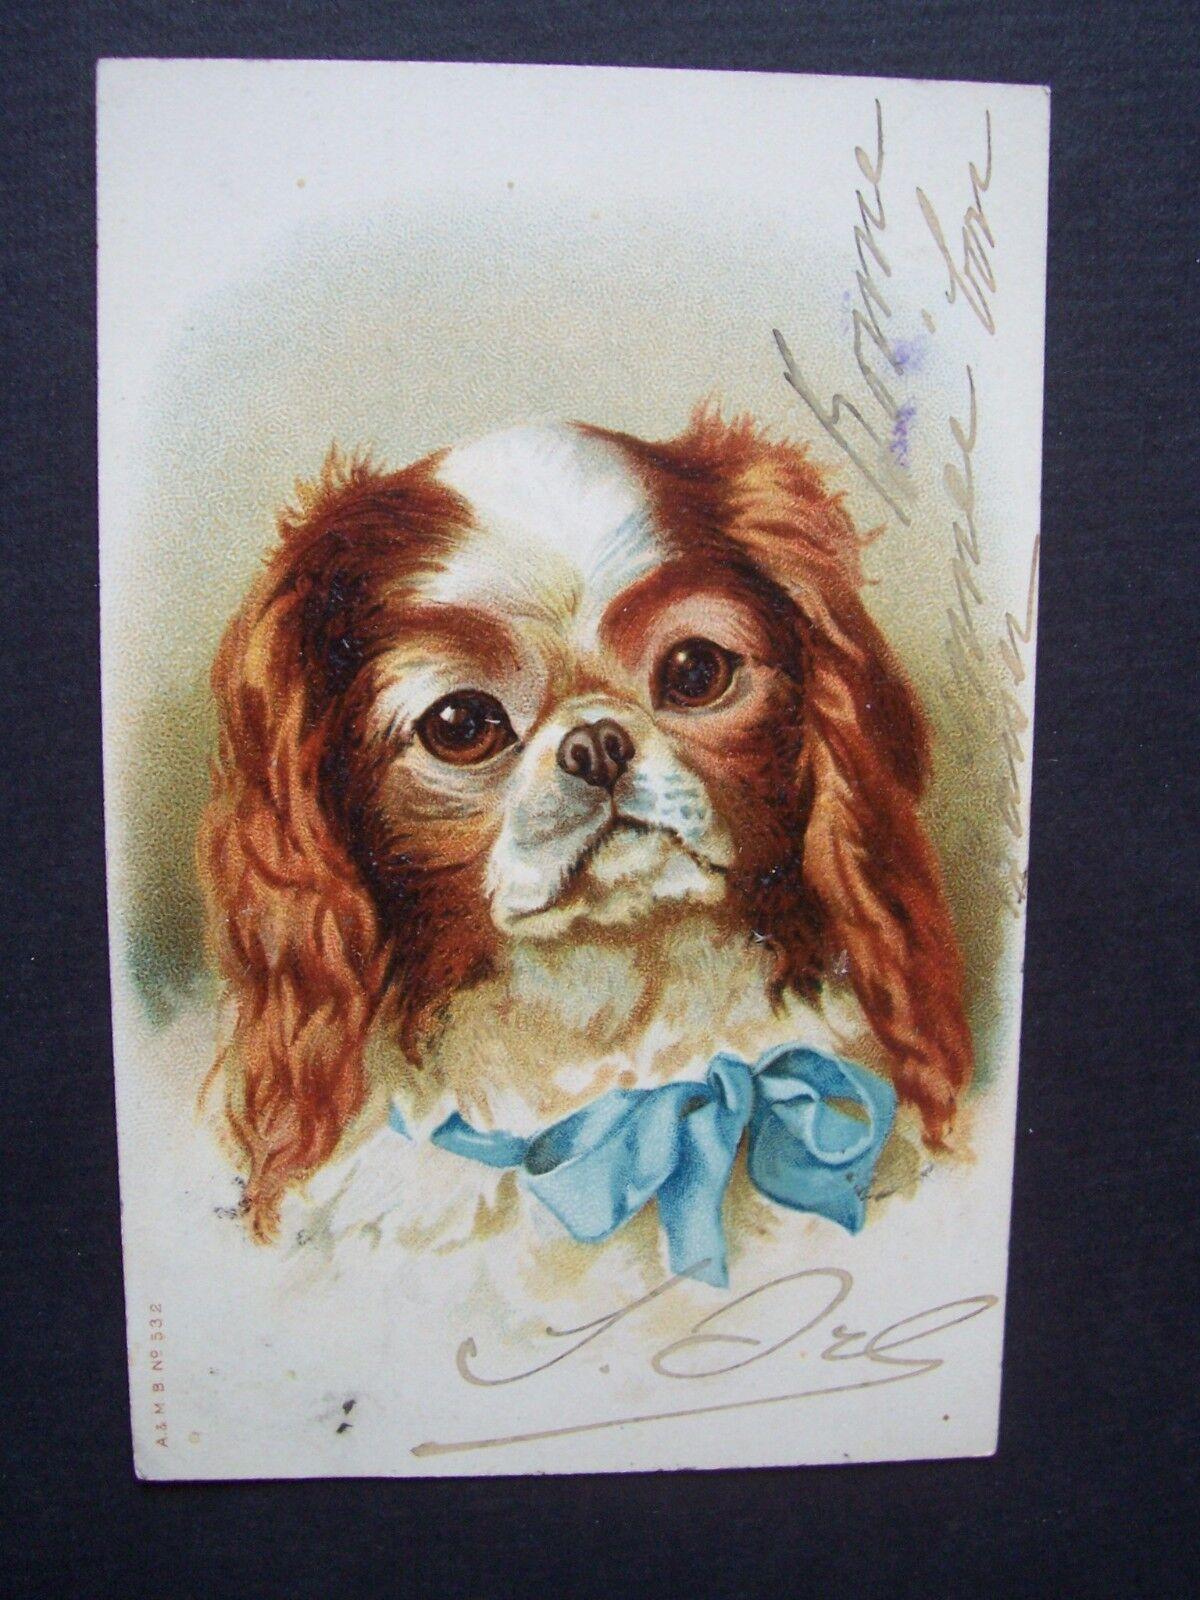 Cpa  - chien - cavalier king charles spaniel  ( ? ) - illustrateur non mentionné